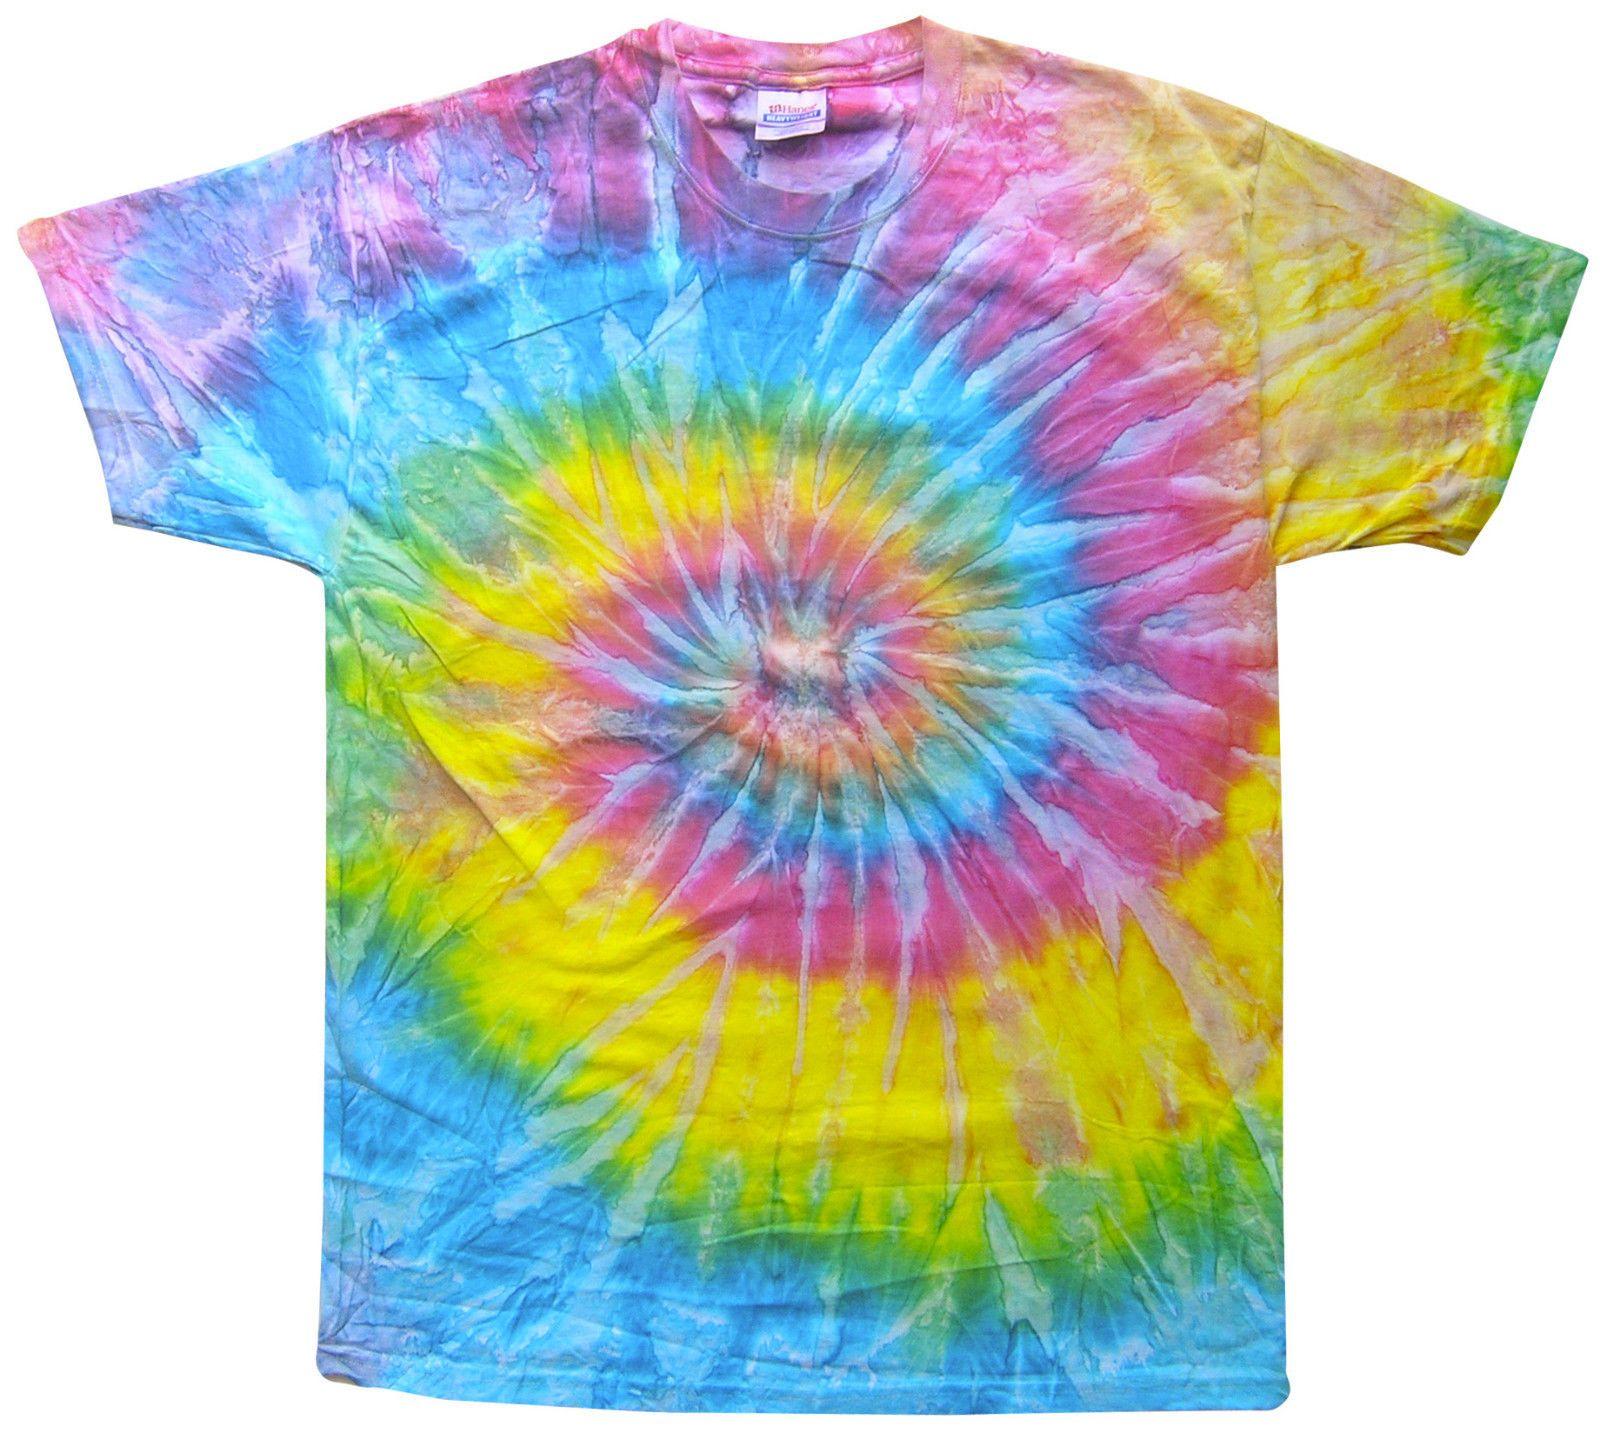 2c4313b0dde Tie Dye T-Shirt Saturn Multi-Color Spiral Short Sleeve S M L XL 2XL ...